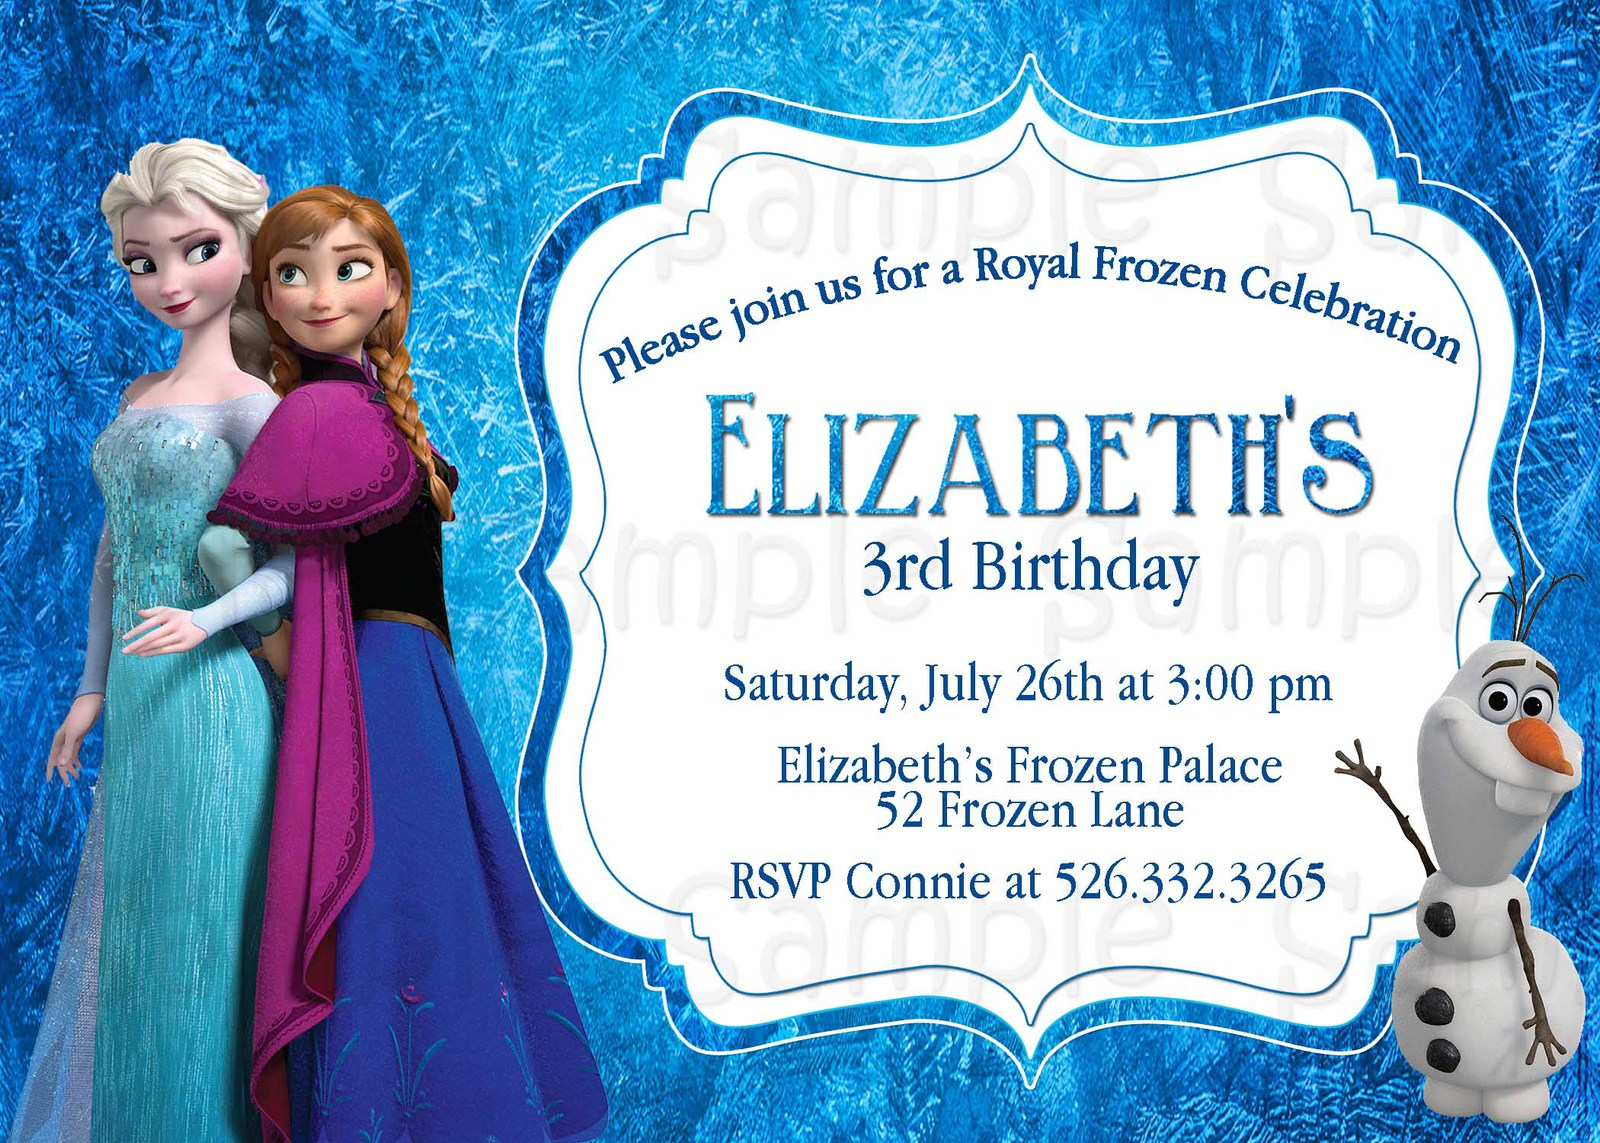 Frozen Birthday - Frozen birthday party invitation template free